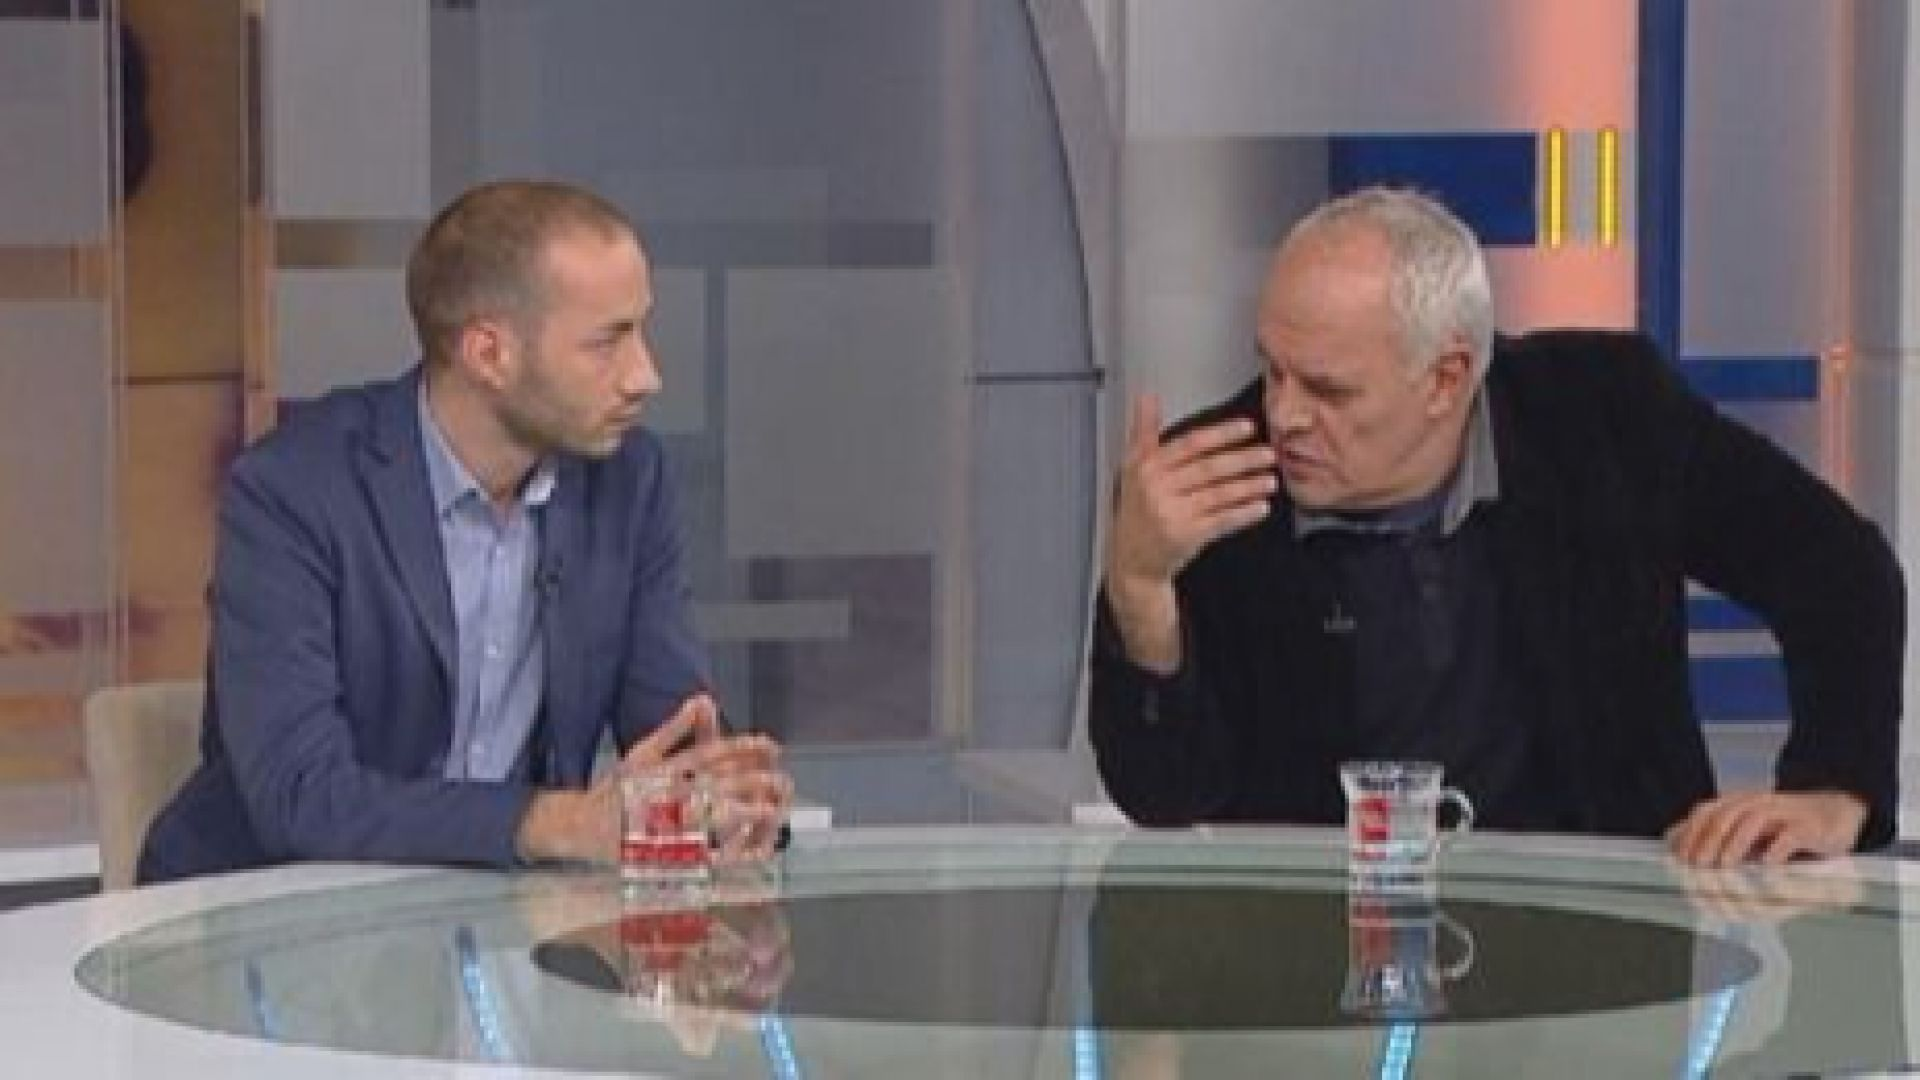 Андрей Райчев: ГЕРБ са под бомбардировка, грешат от нерви